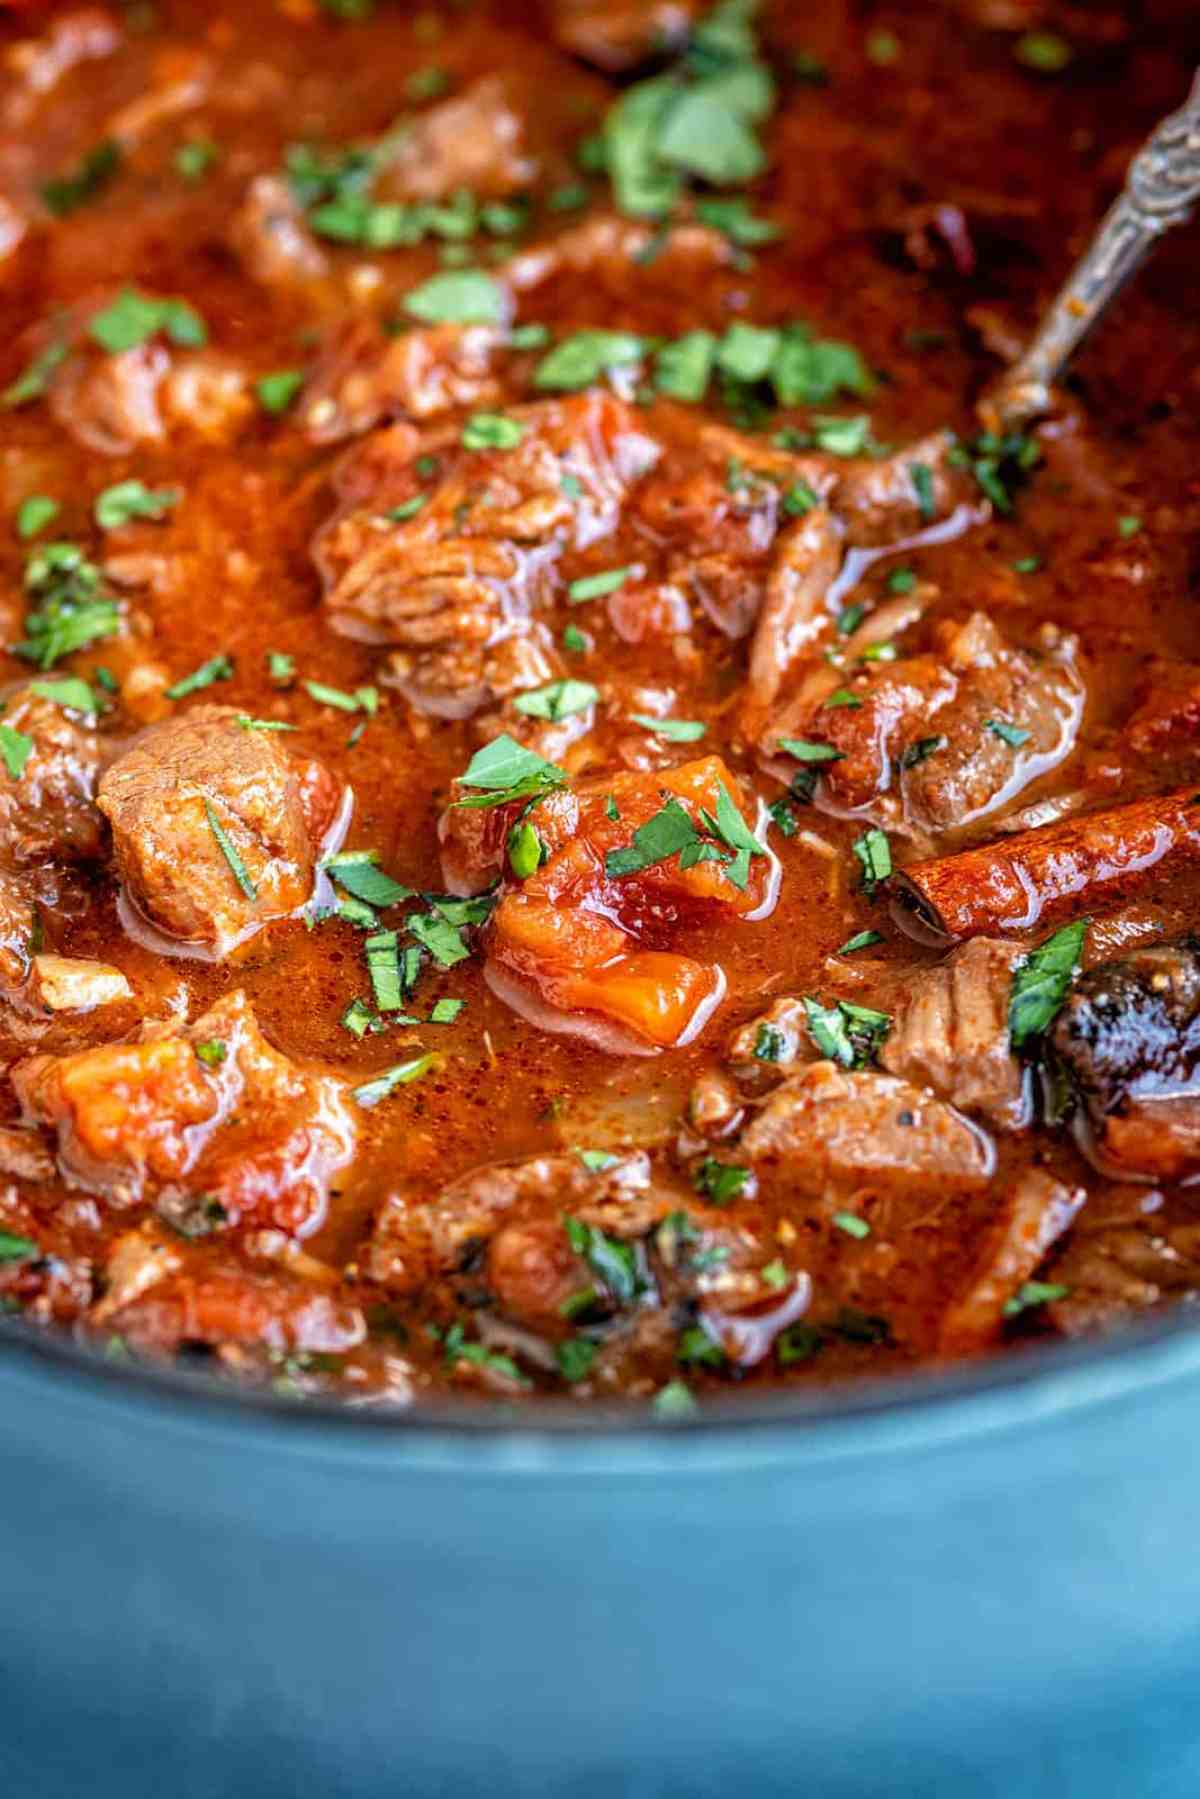 Greek beef stew